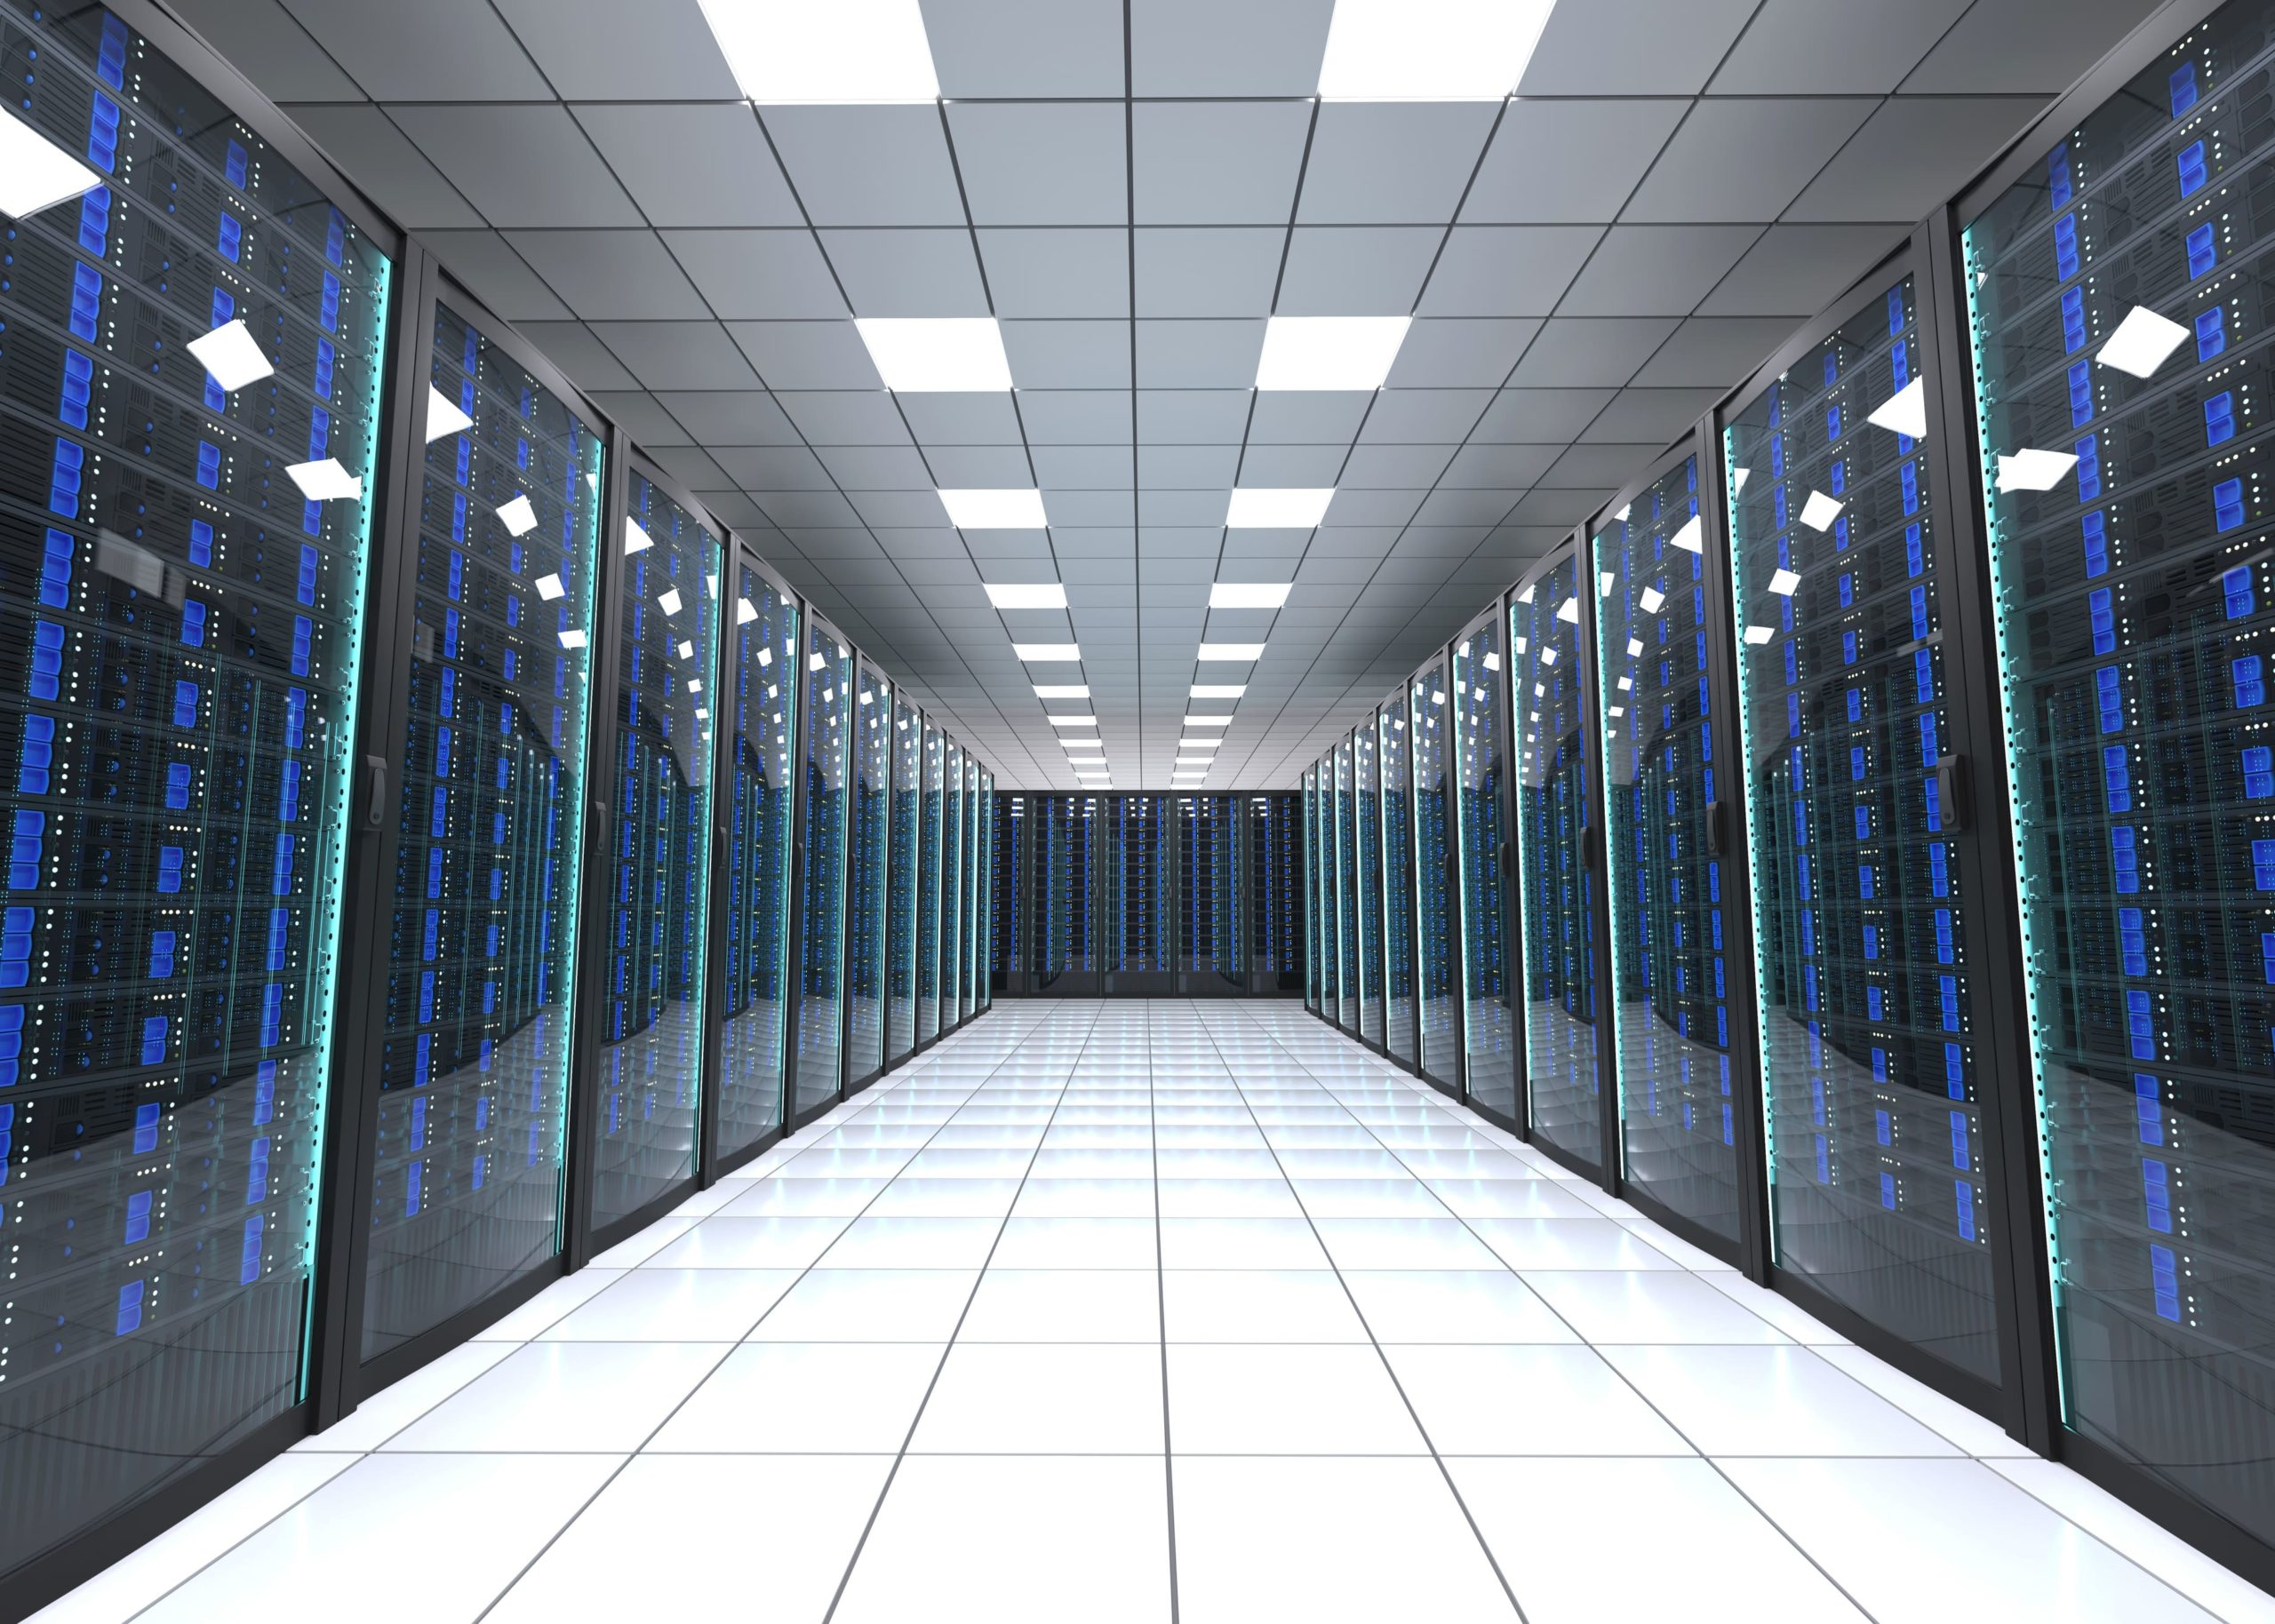 Increasing data reliability | Eleven